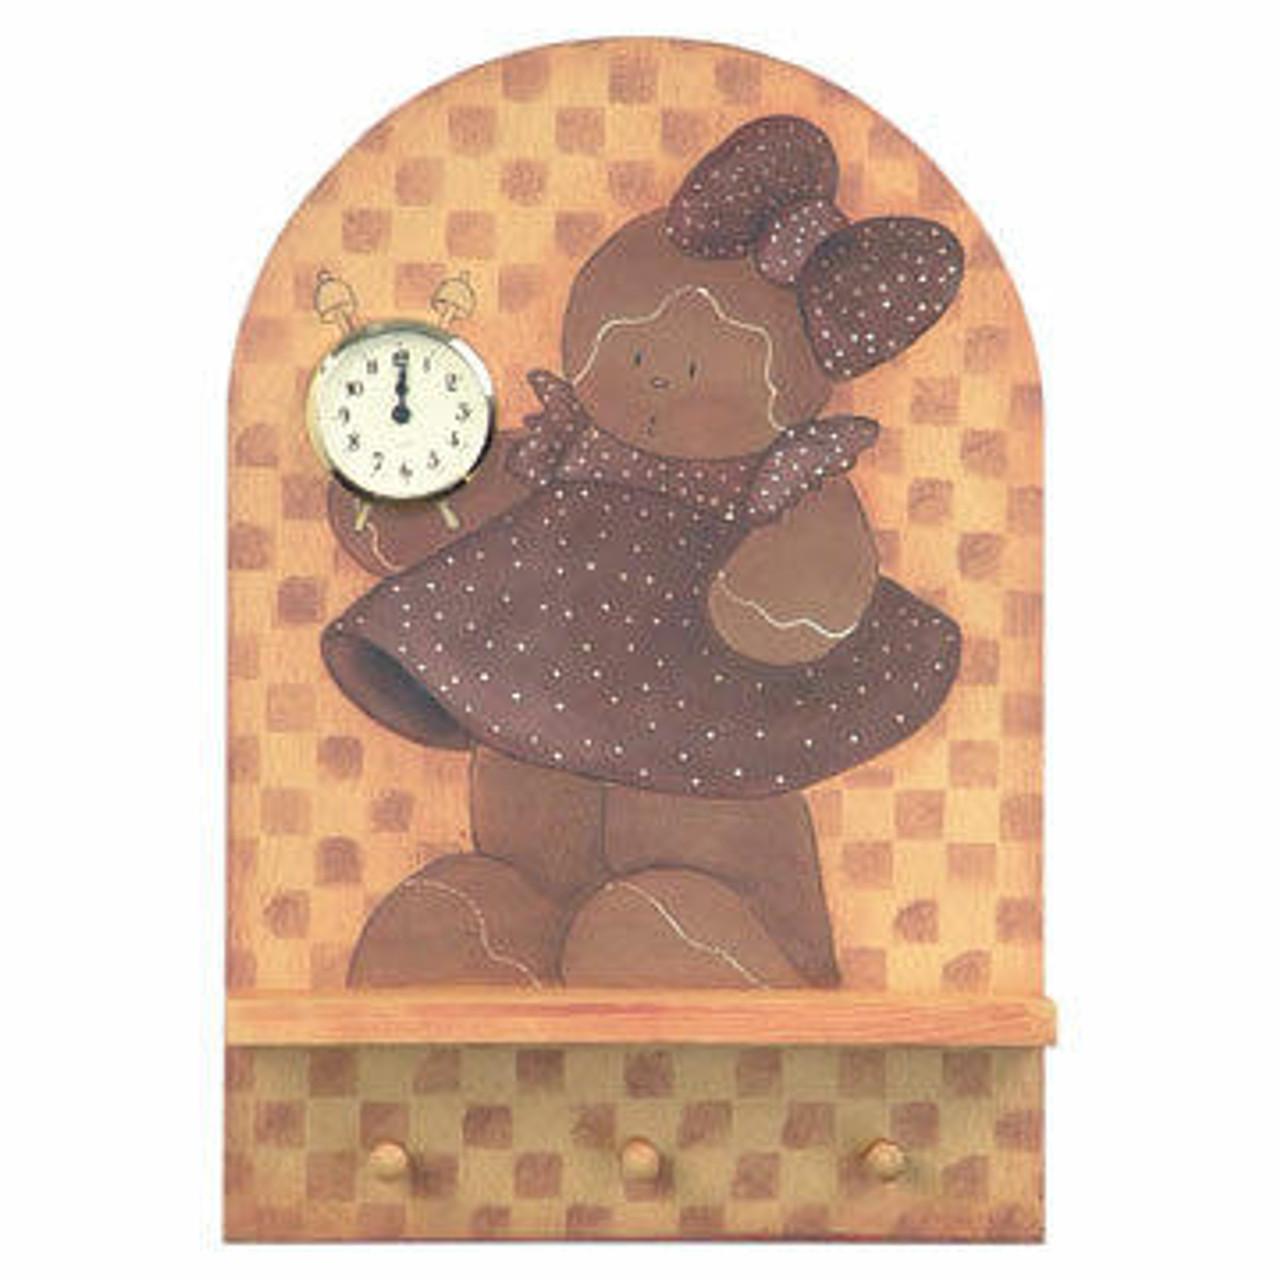 Cherry Tree Toys Gingerbread Clock Plan